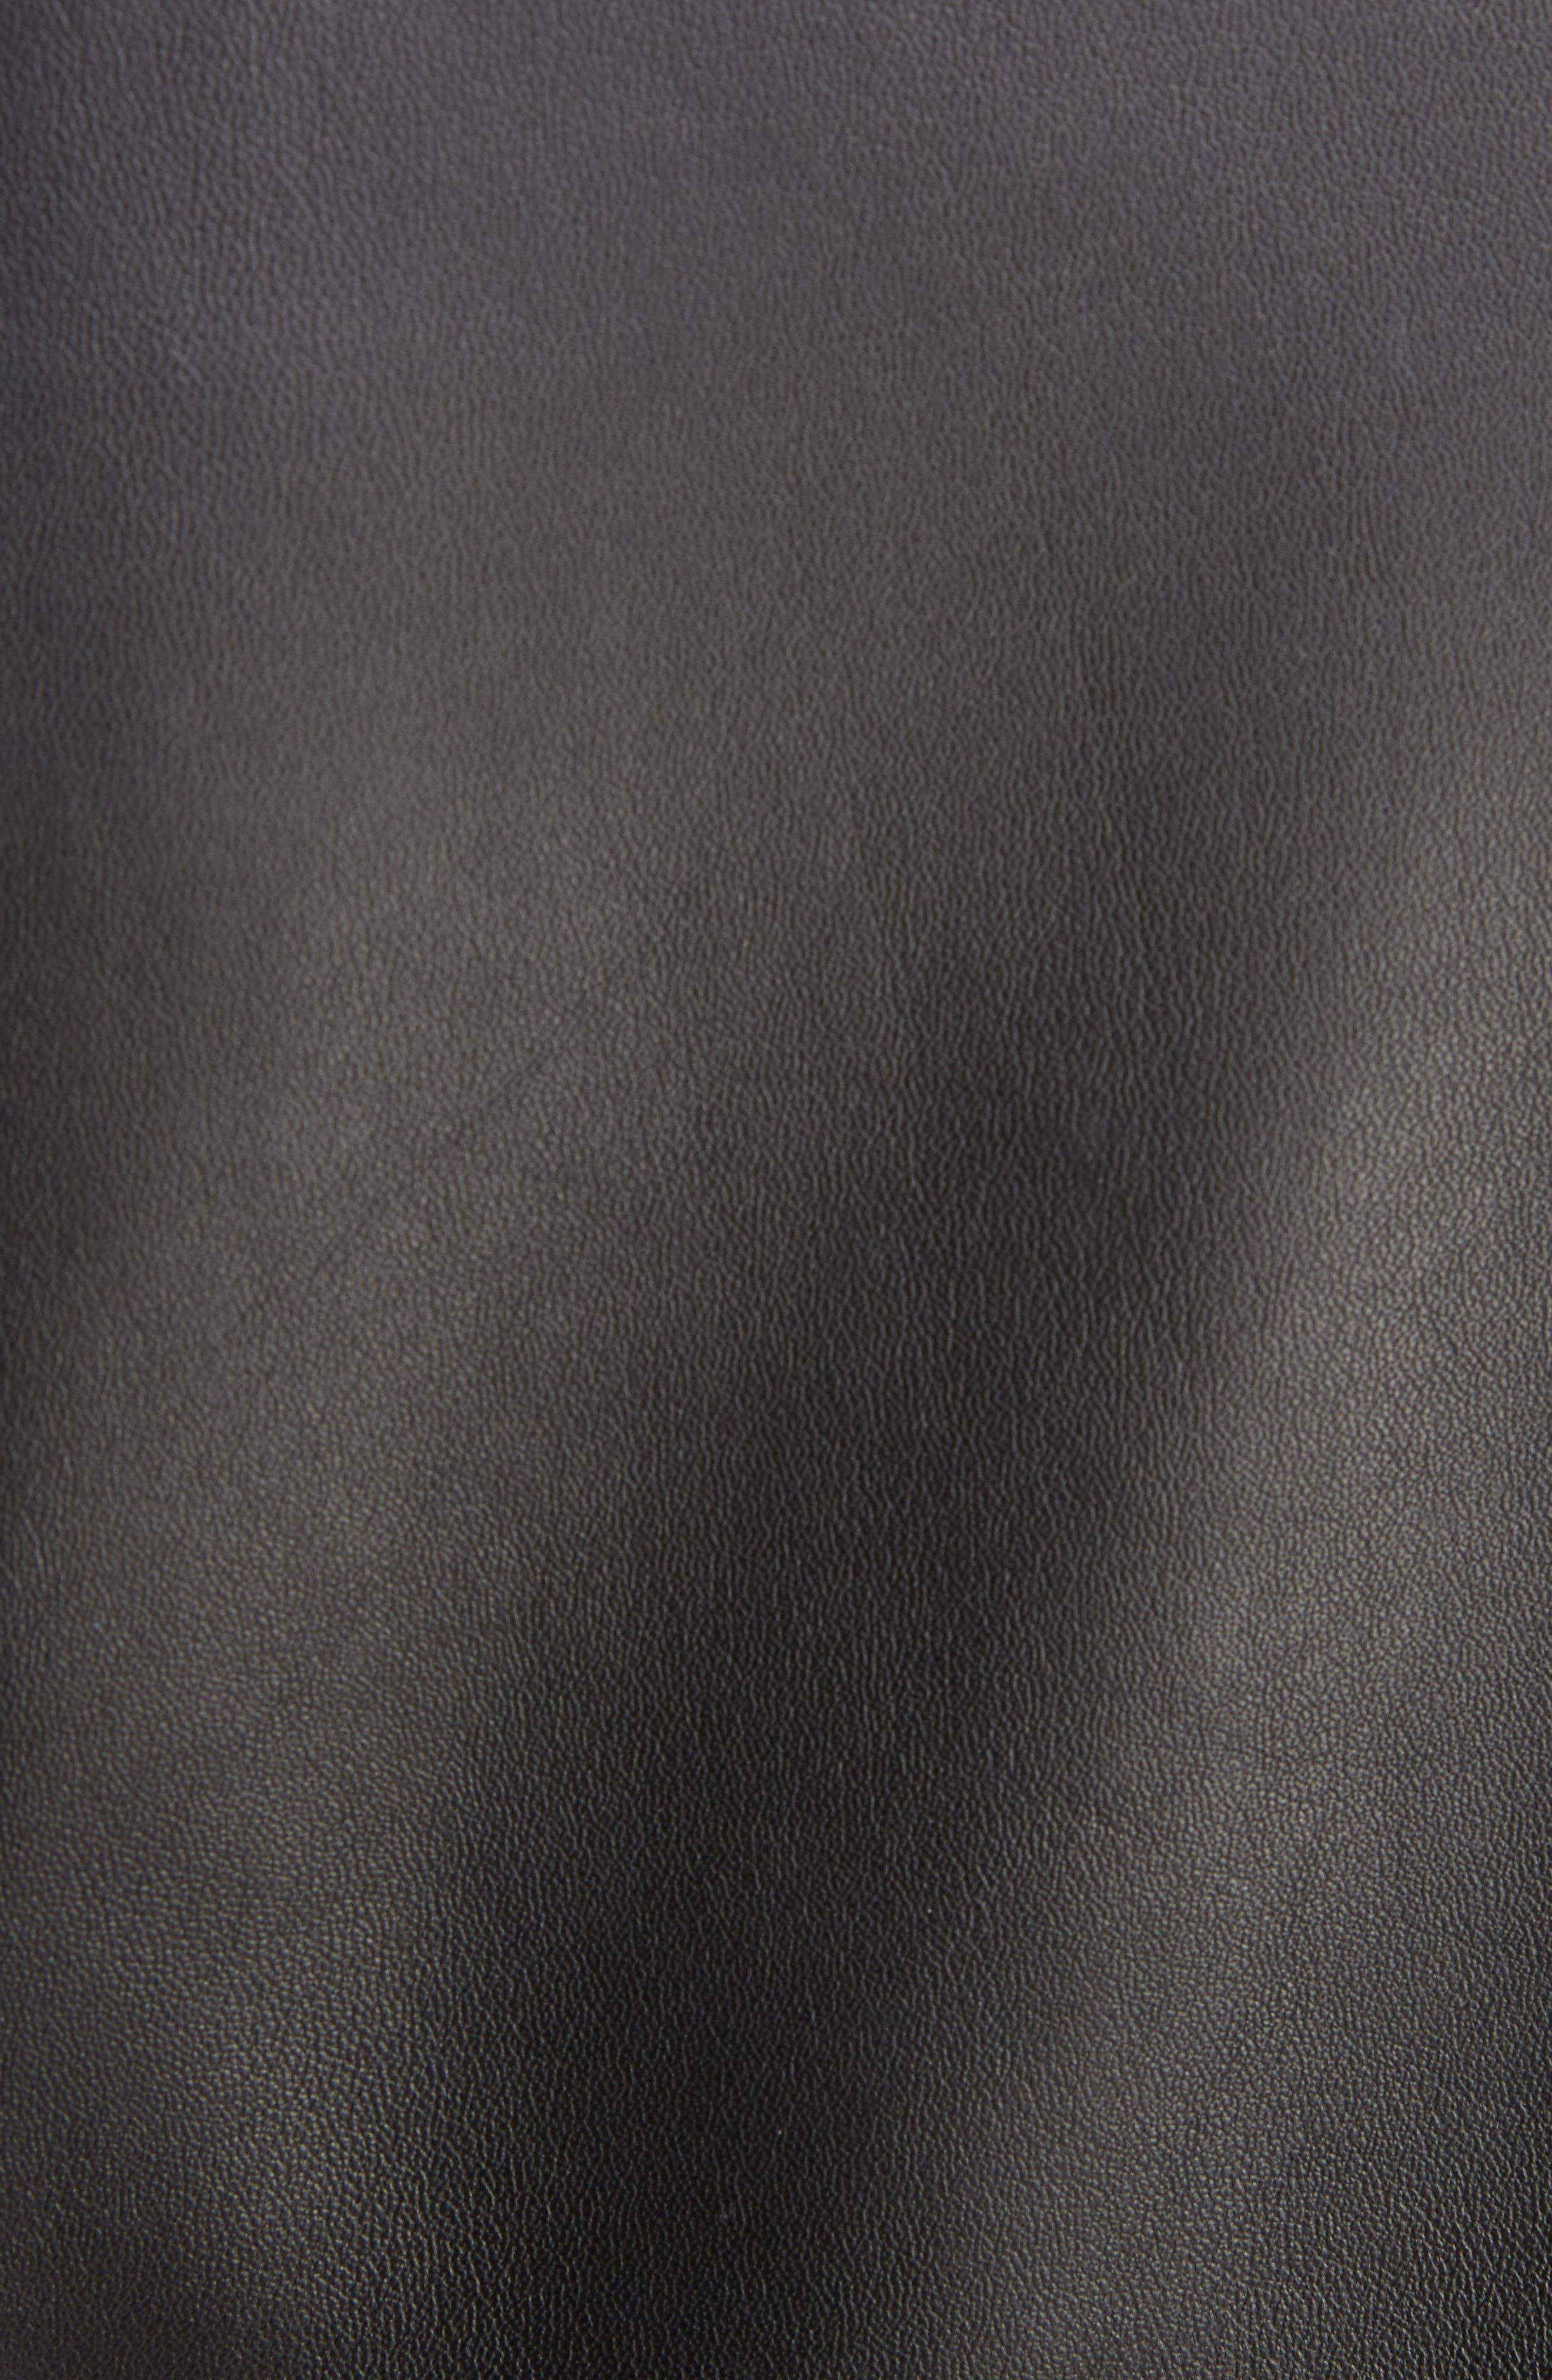 Studded Leather Moto Jacket,                             Alternate thumbnail 6, color,                             001